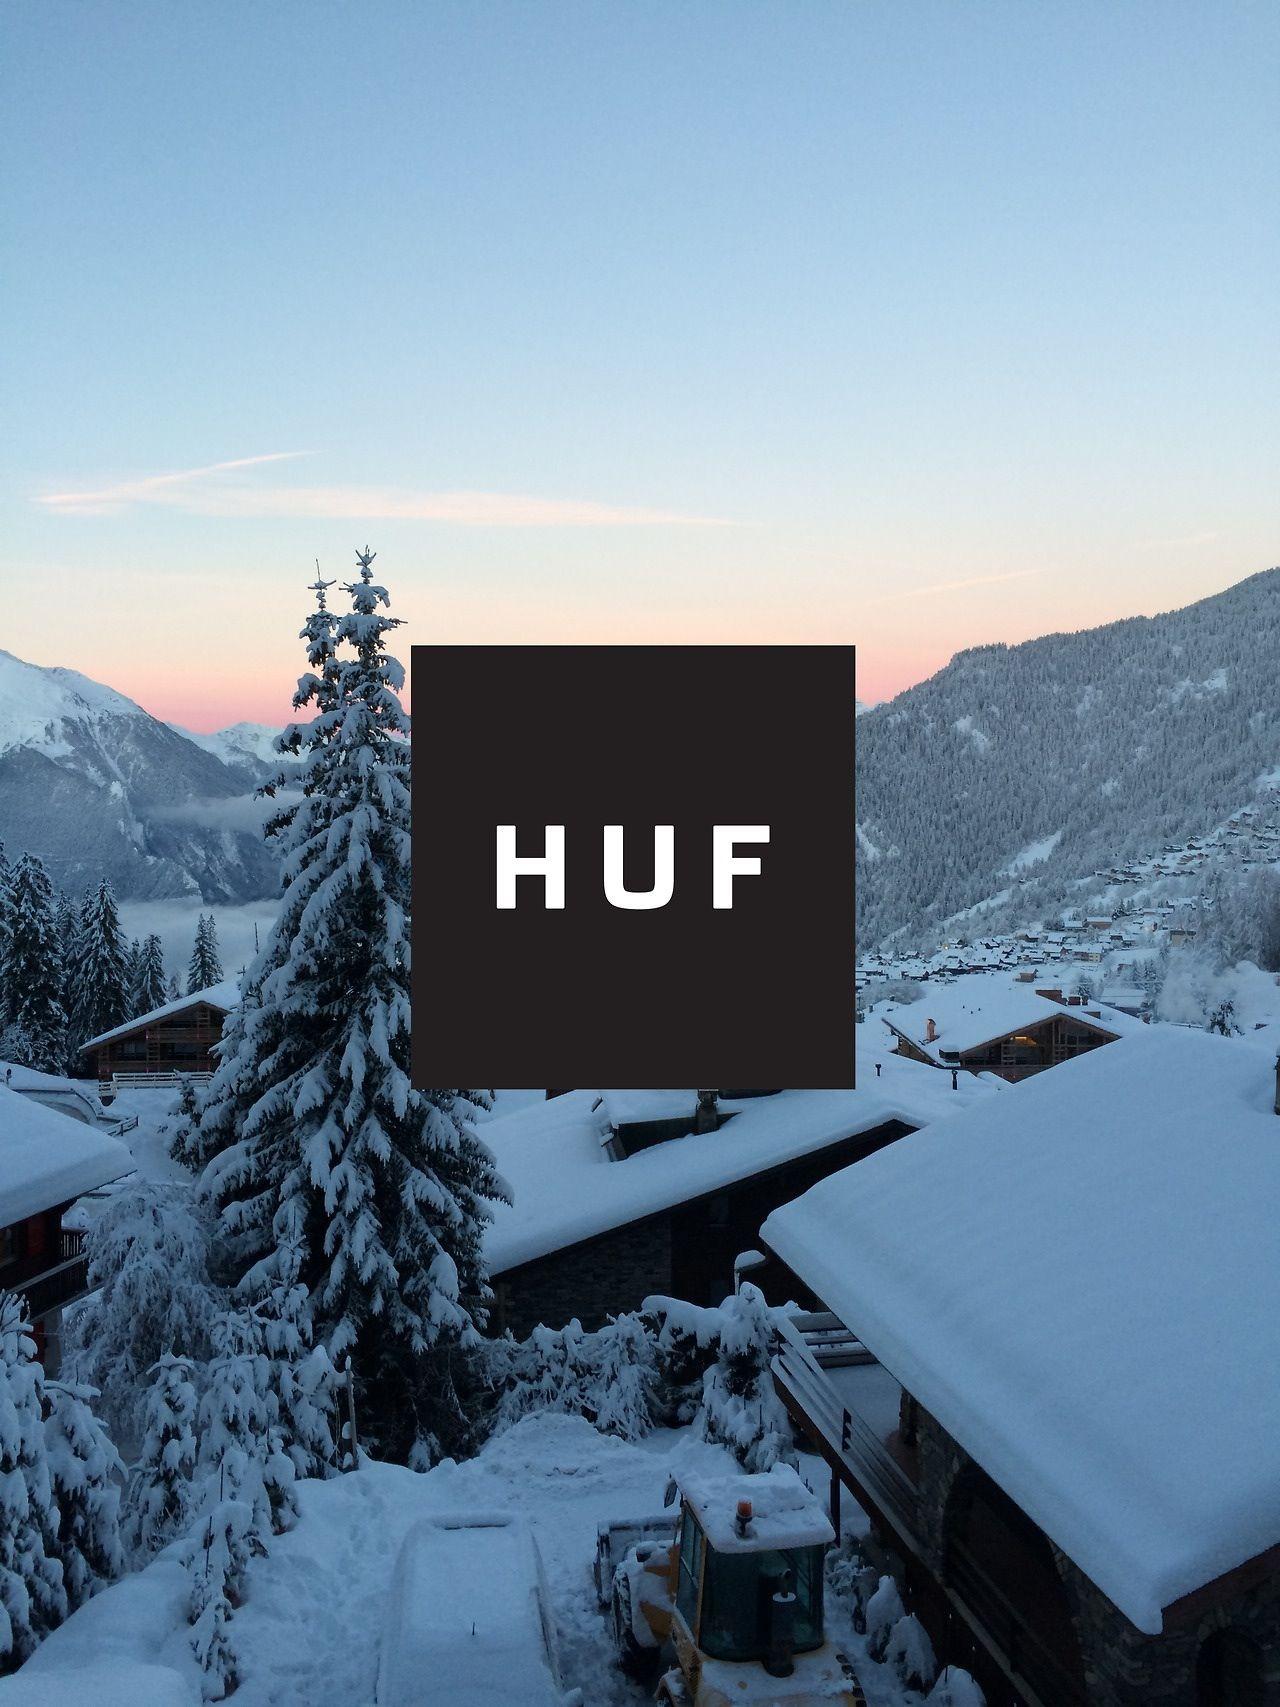 huf wallpaper ipad iphone ipod   Snowboard Backgrounds 1280x1707